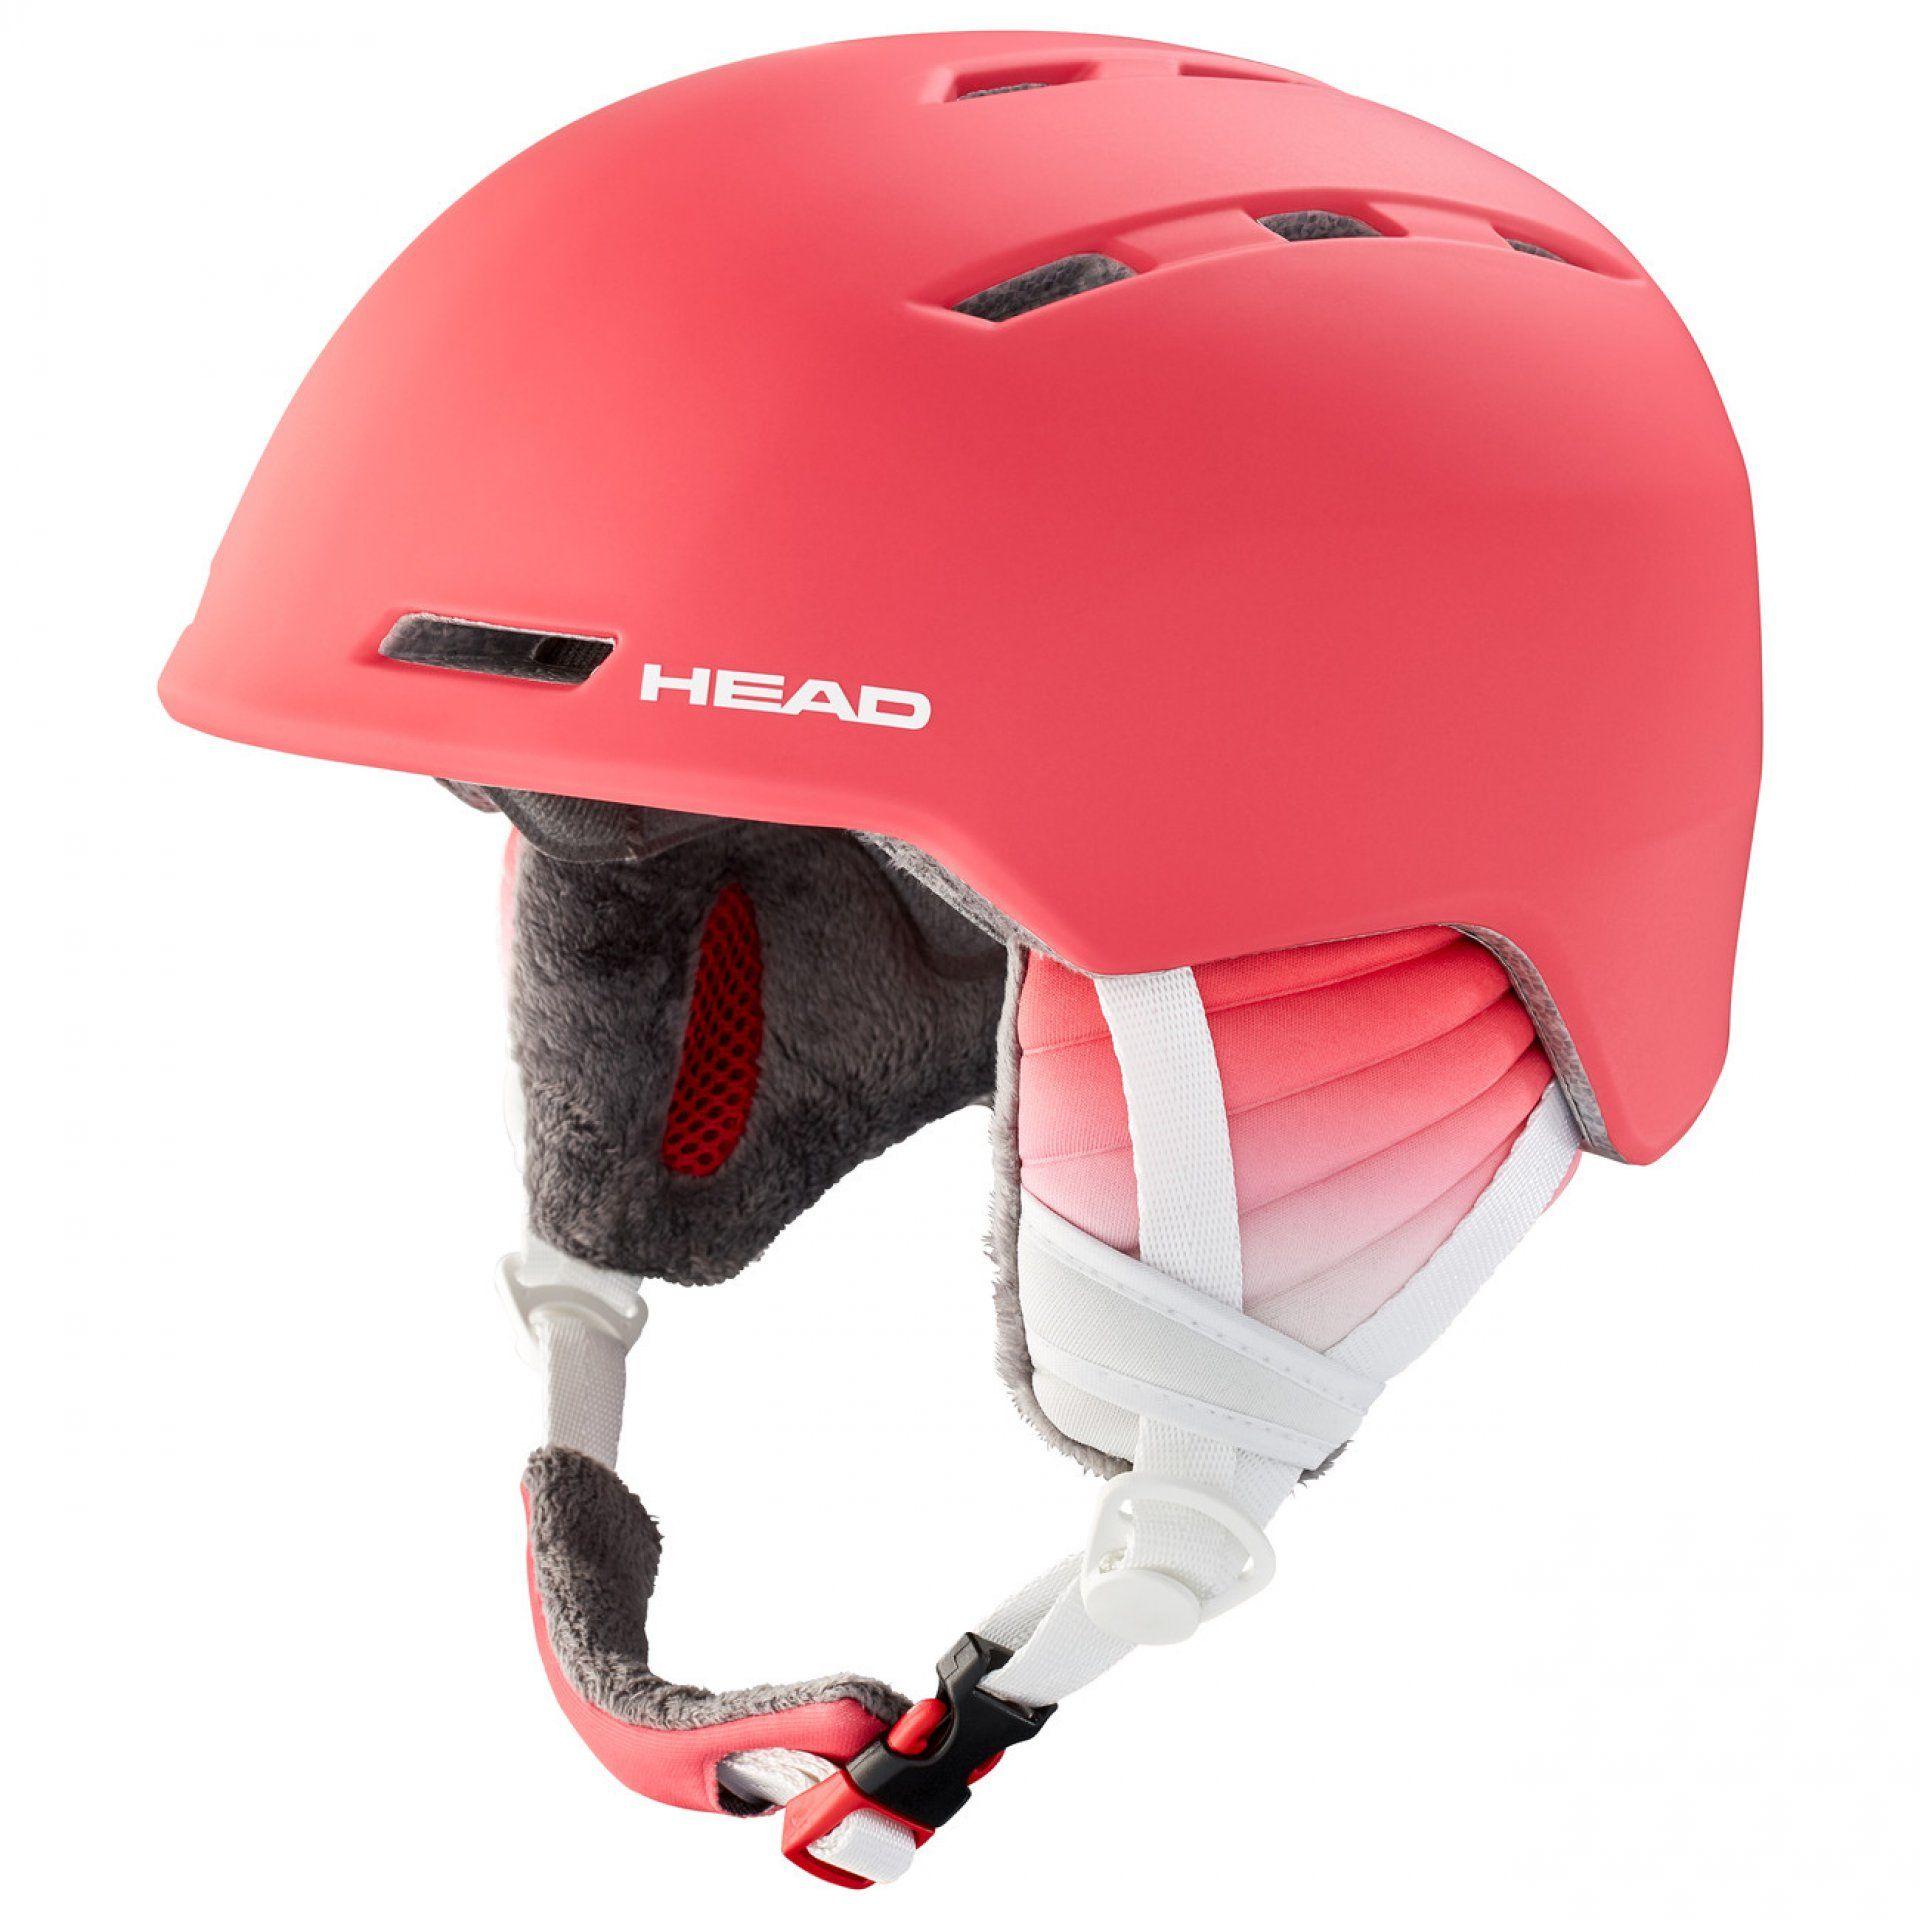 KASK HEAD VALERY 325580 CORAL